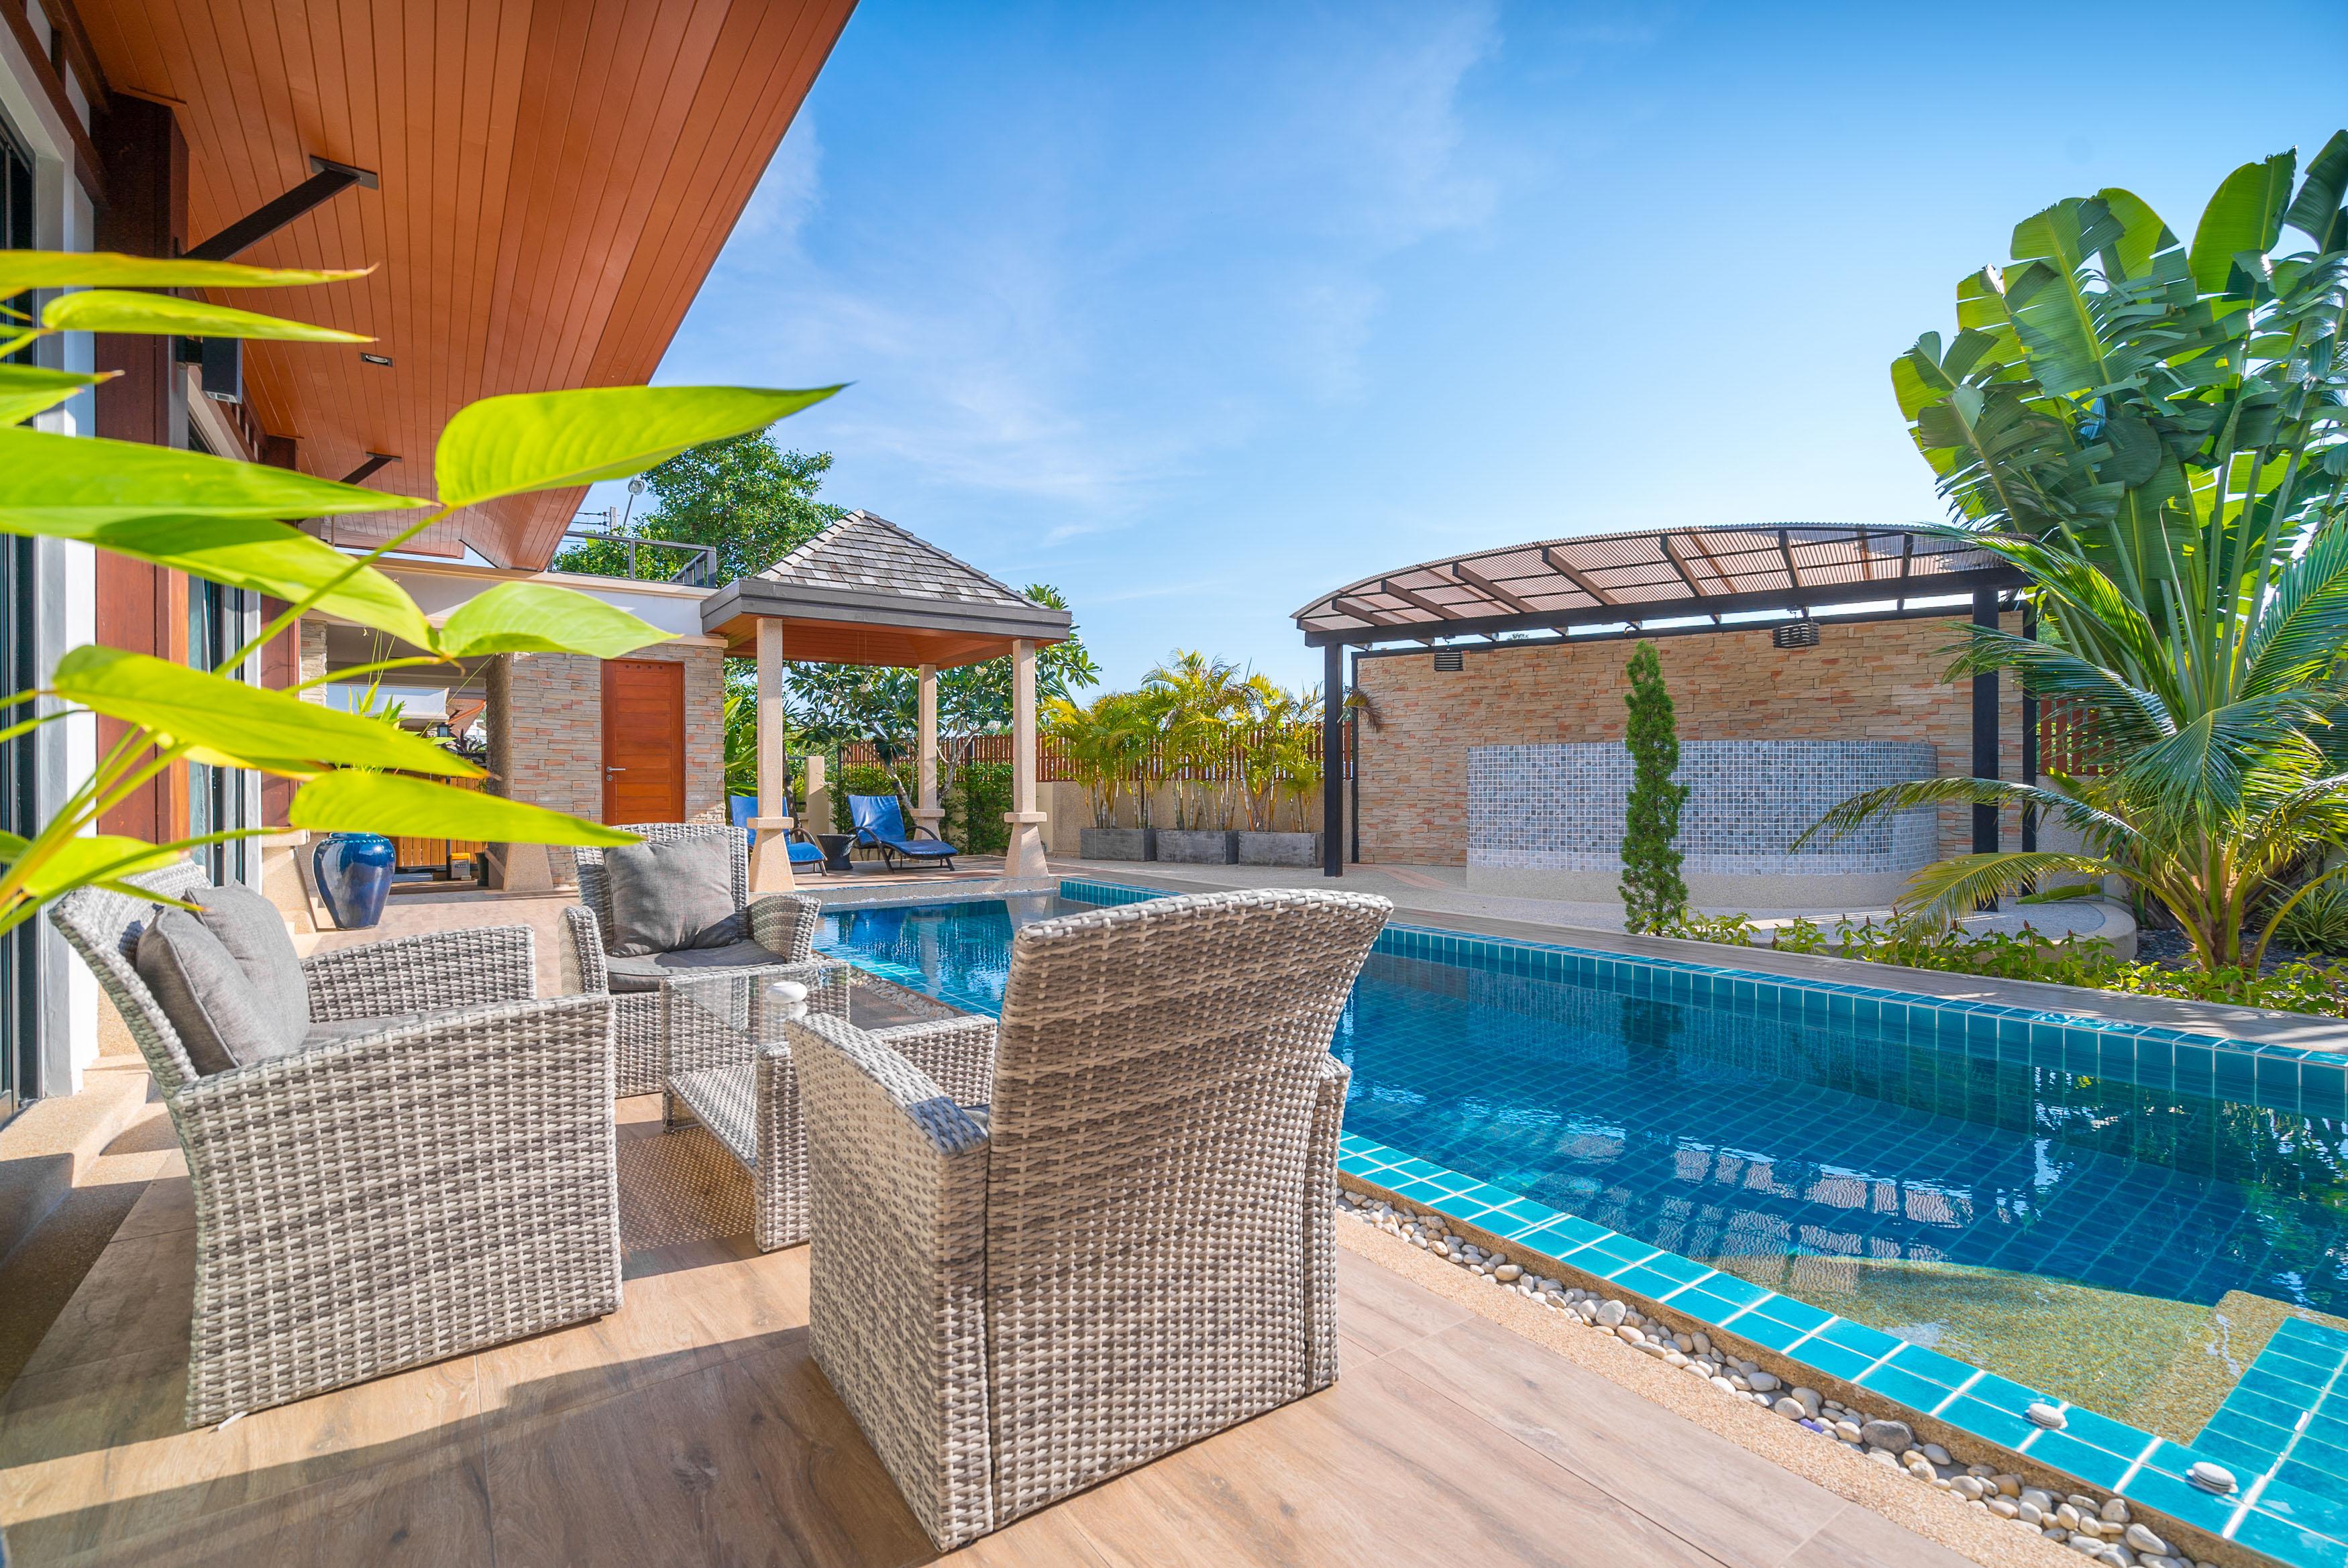 Pool Villa for rent ID RW-199